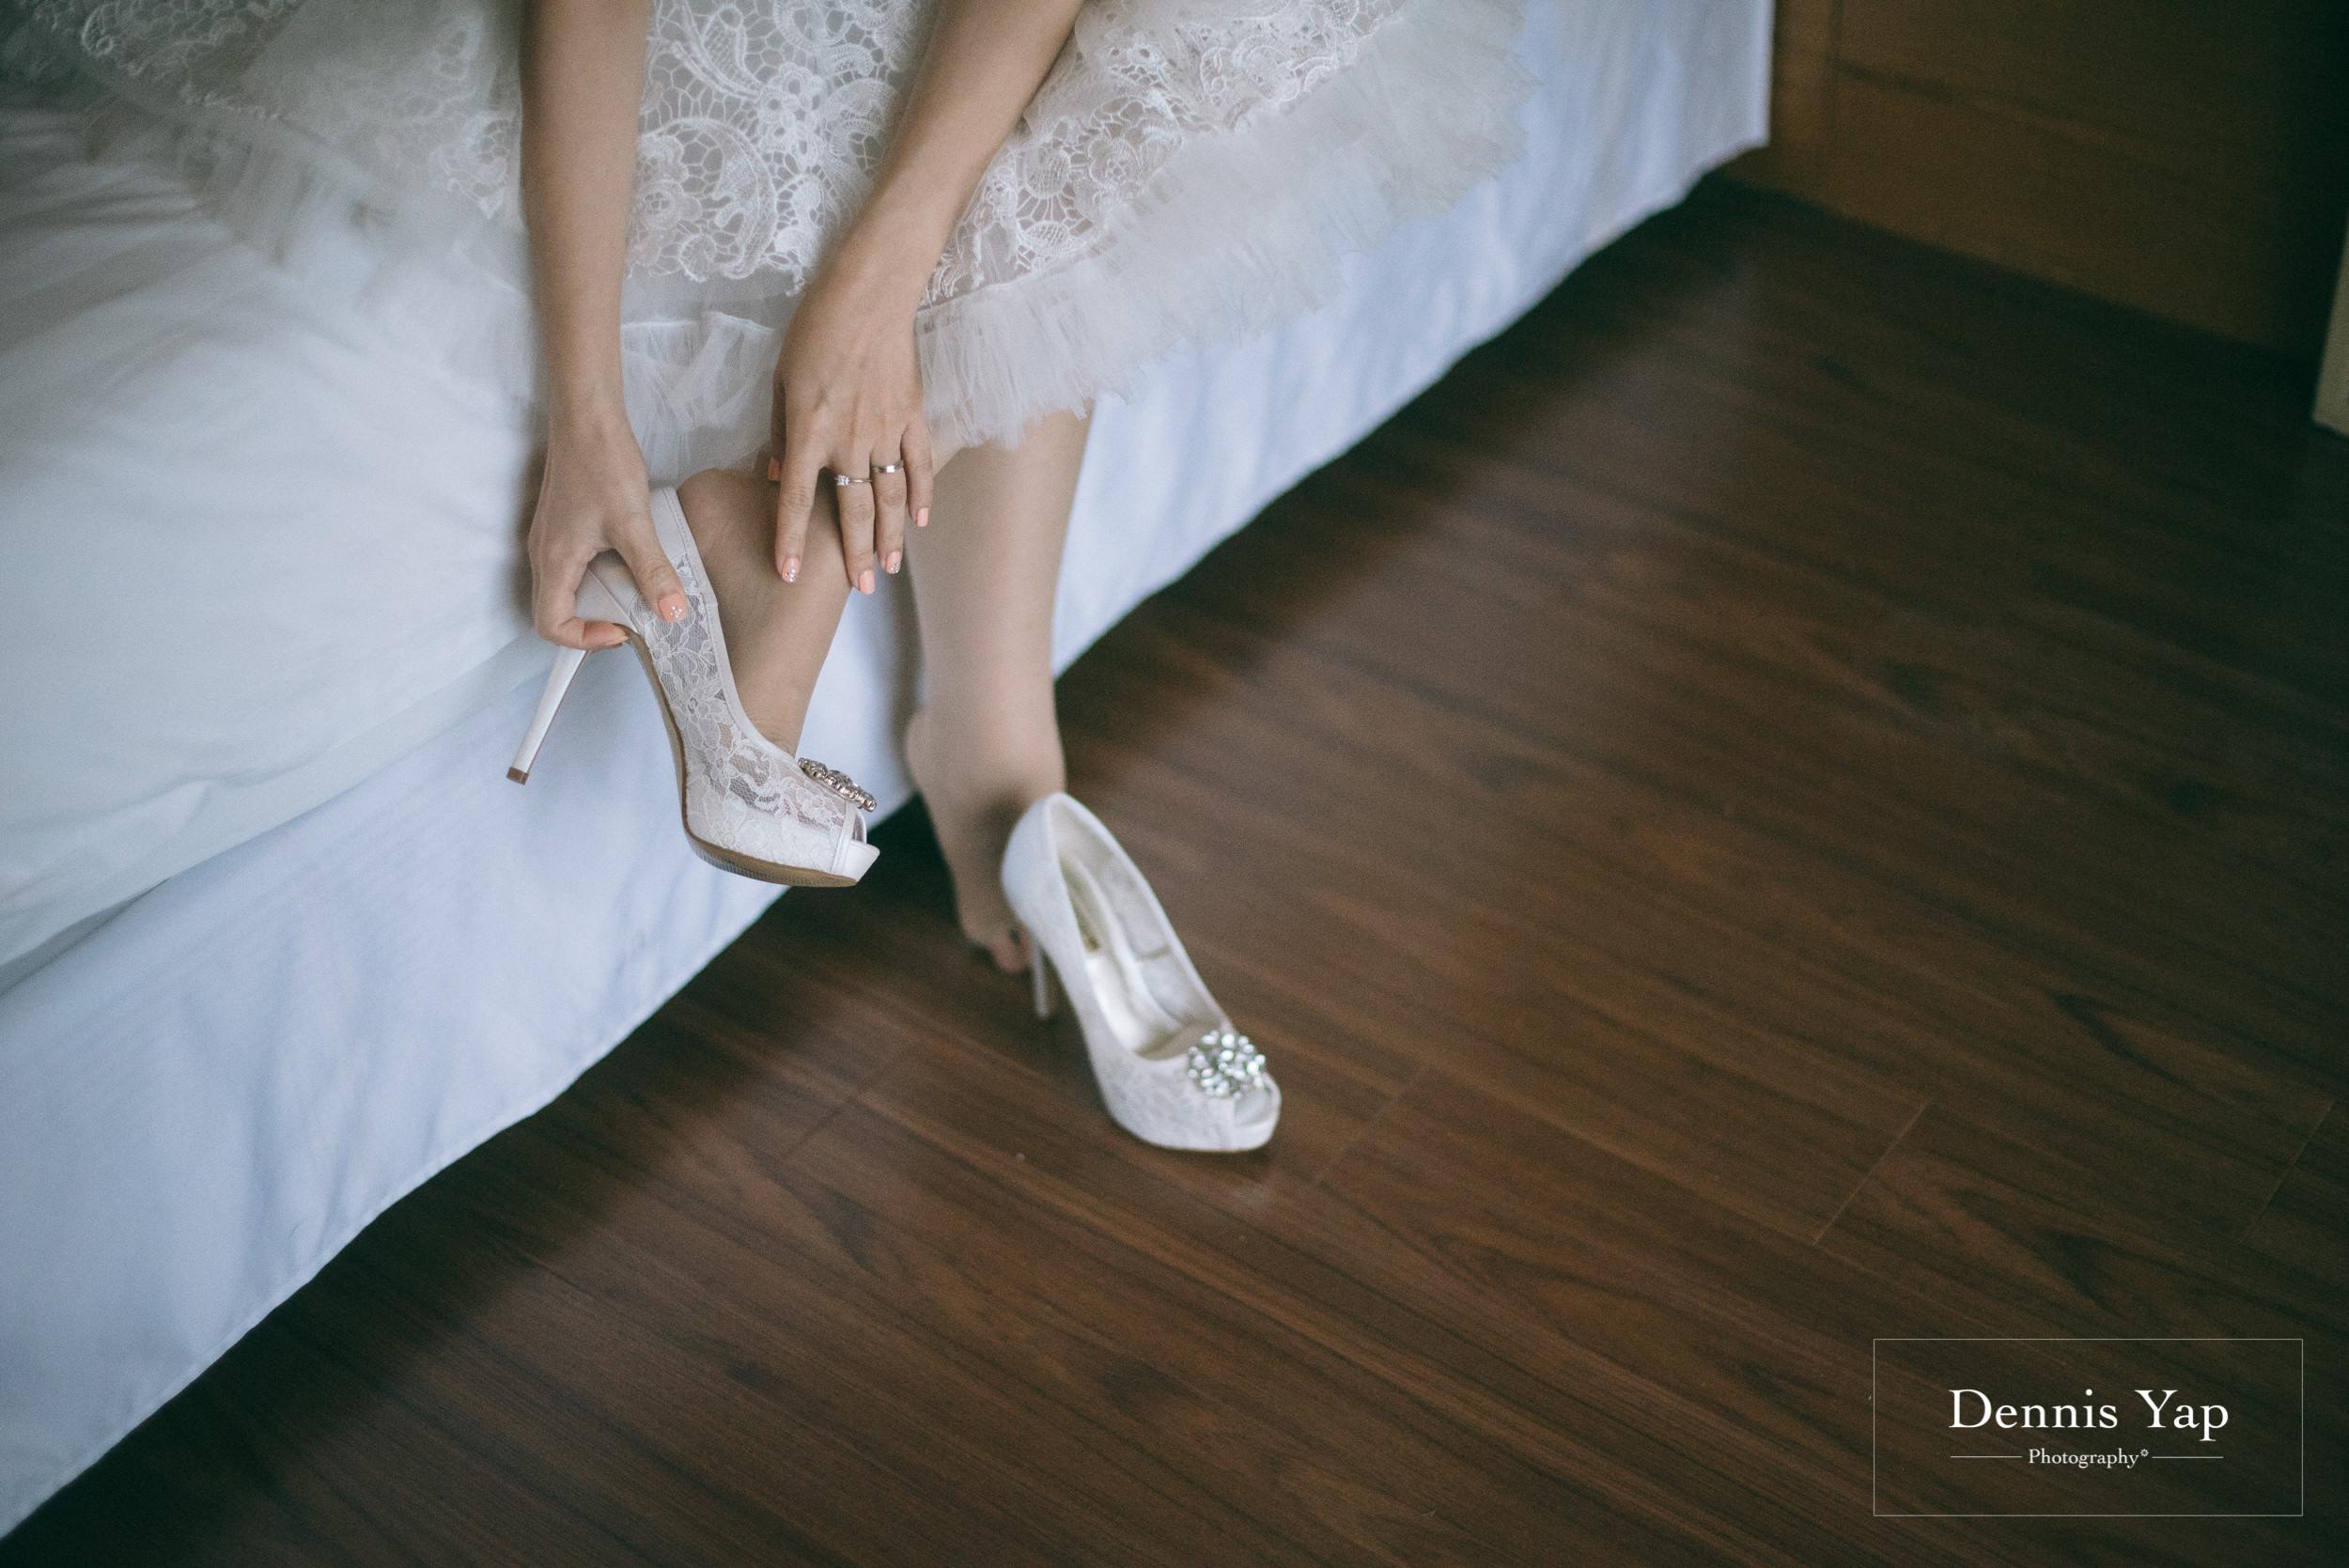 alex eivan wedding day kuala lumpur malaysia dennis yap photography short gown-3.jpg